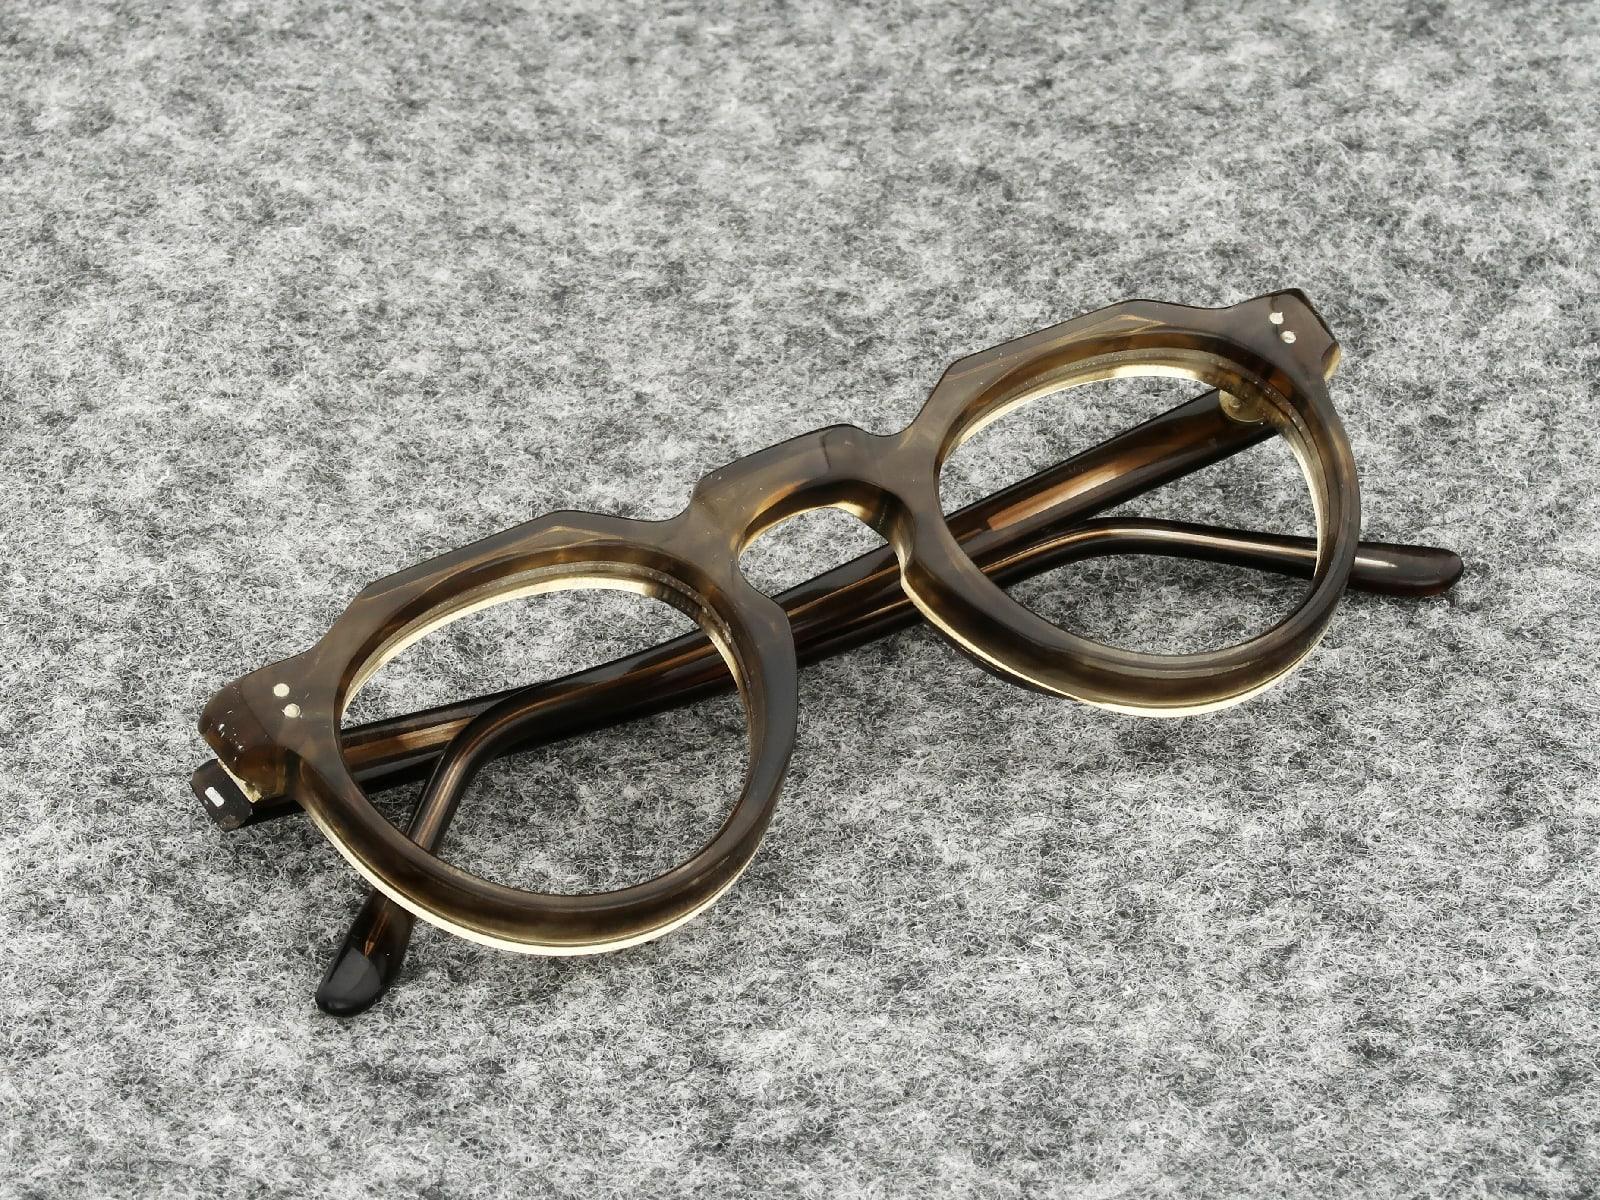 Lesca VINTAGE メガネ CROWN-PANTO 8mm Light-Brown-Marble (v2)